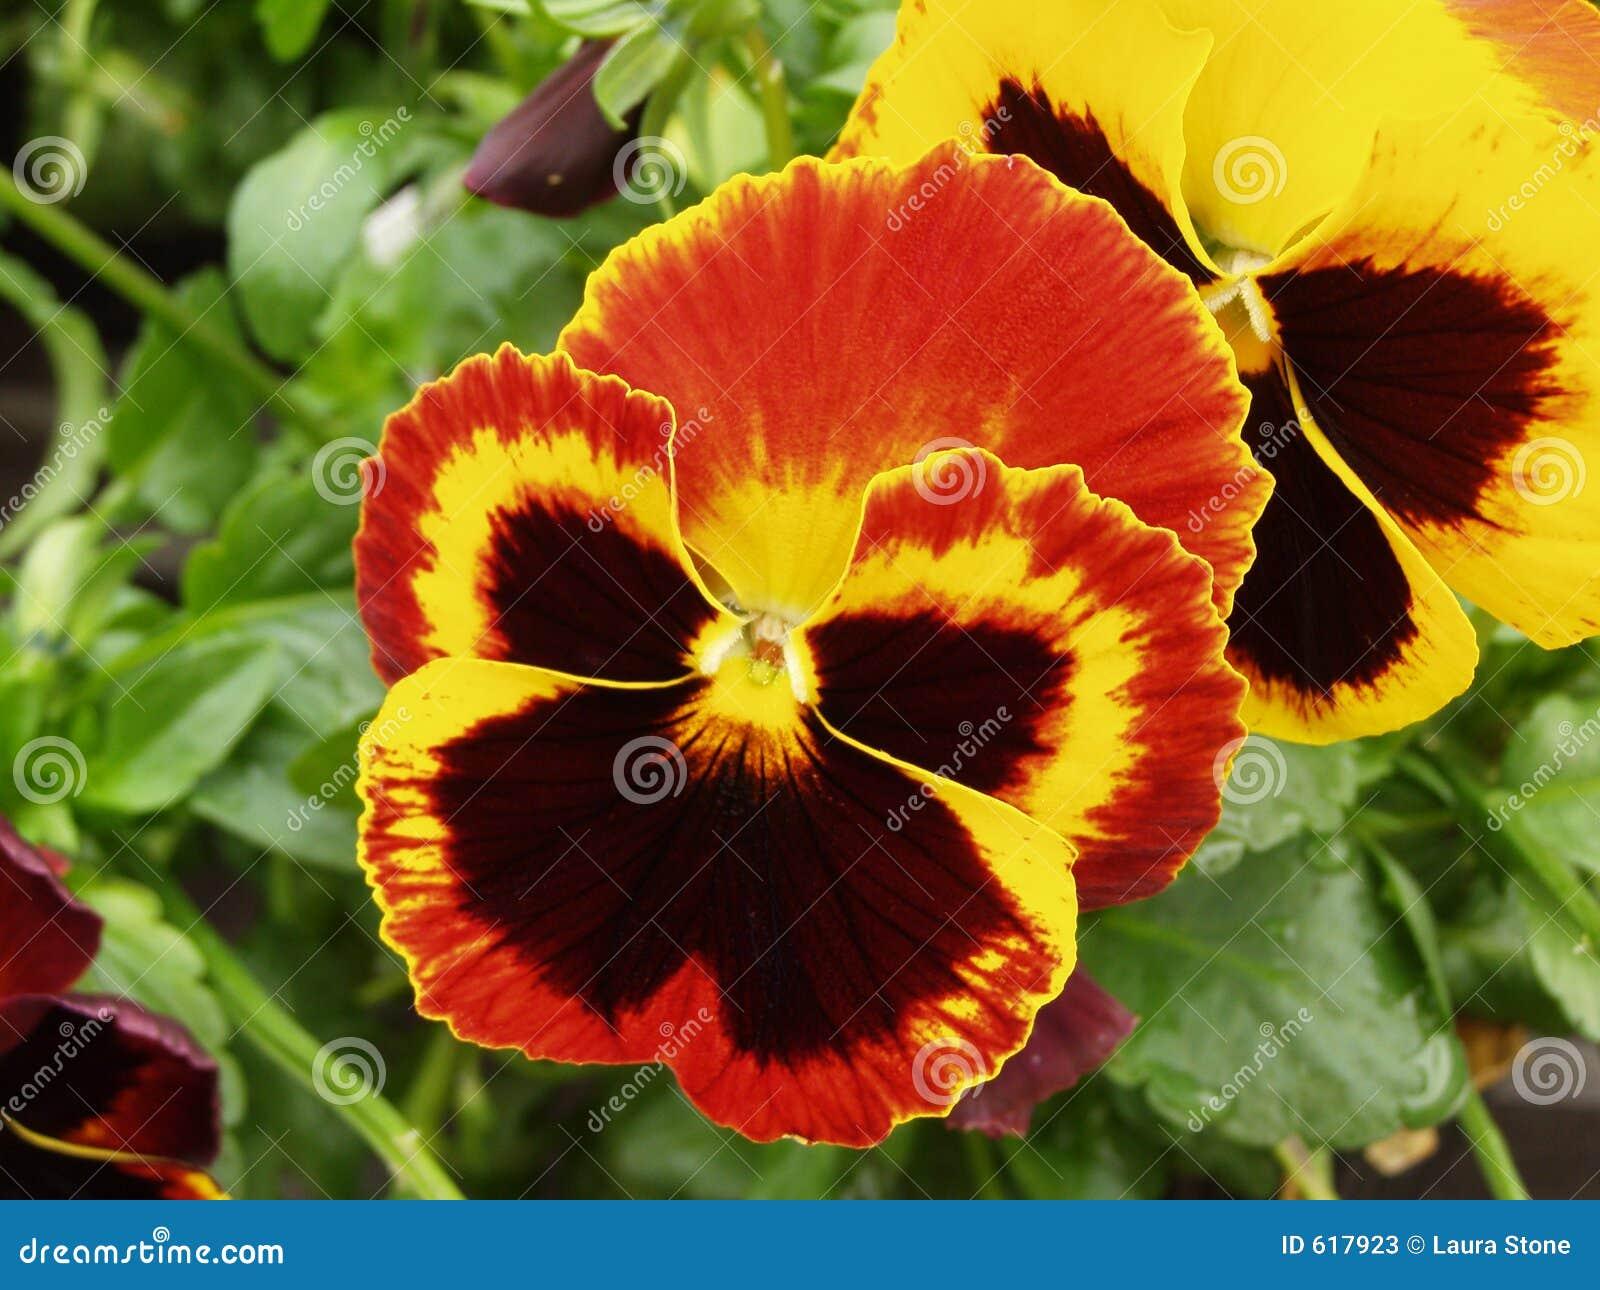 Pensee Orange Image Stock Image Du Jardin Veloute Noir 617923